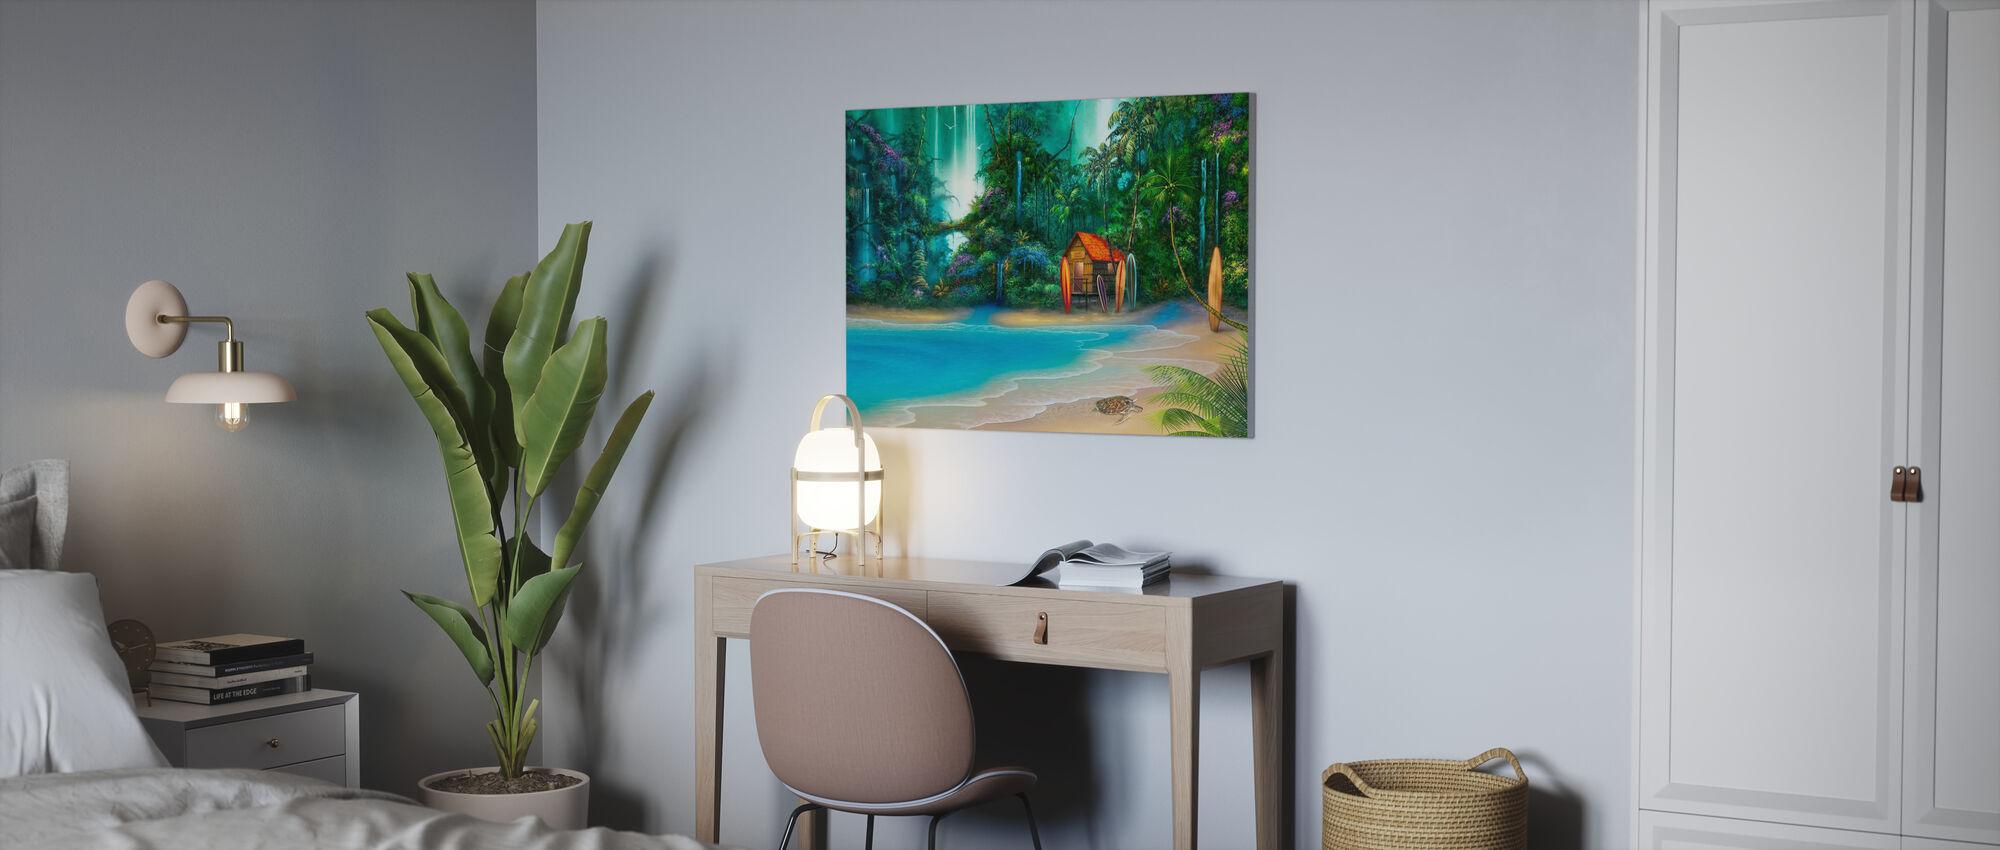 Surf Shack - Canvas print - Office